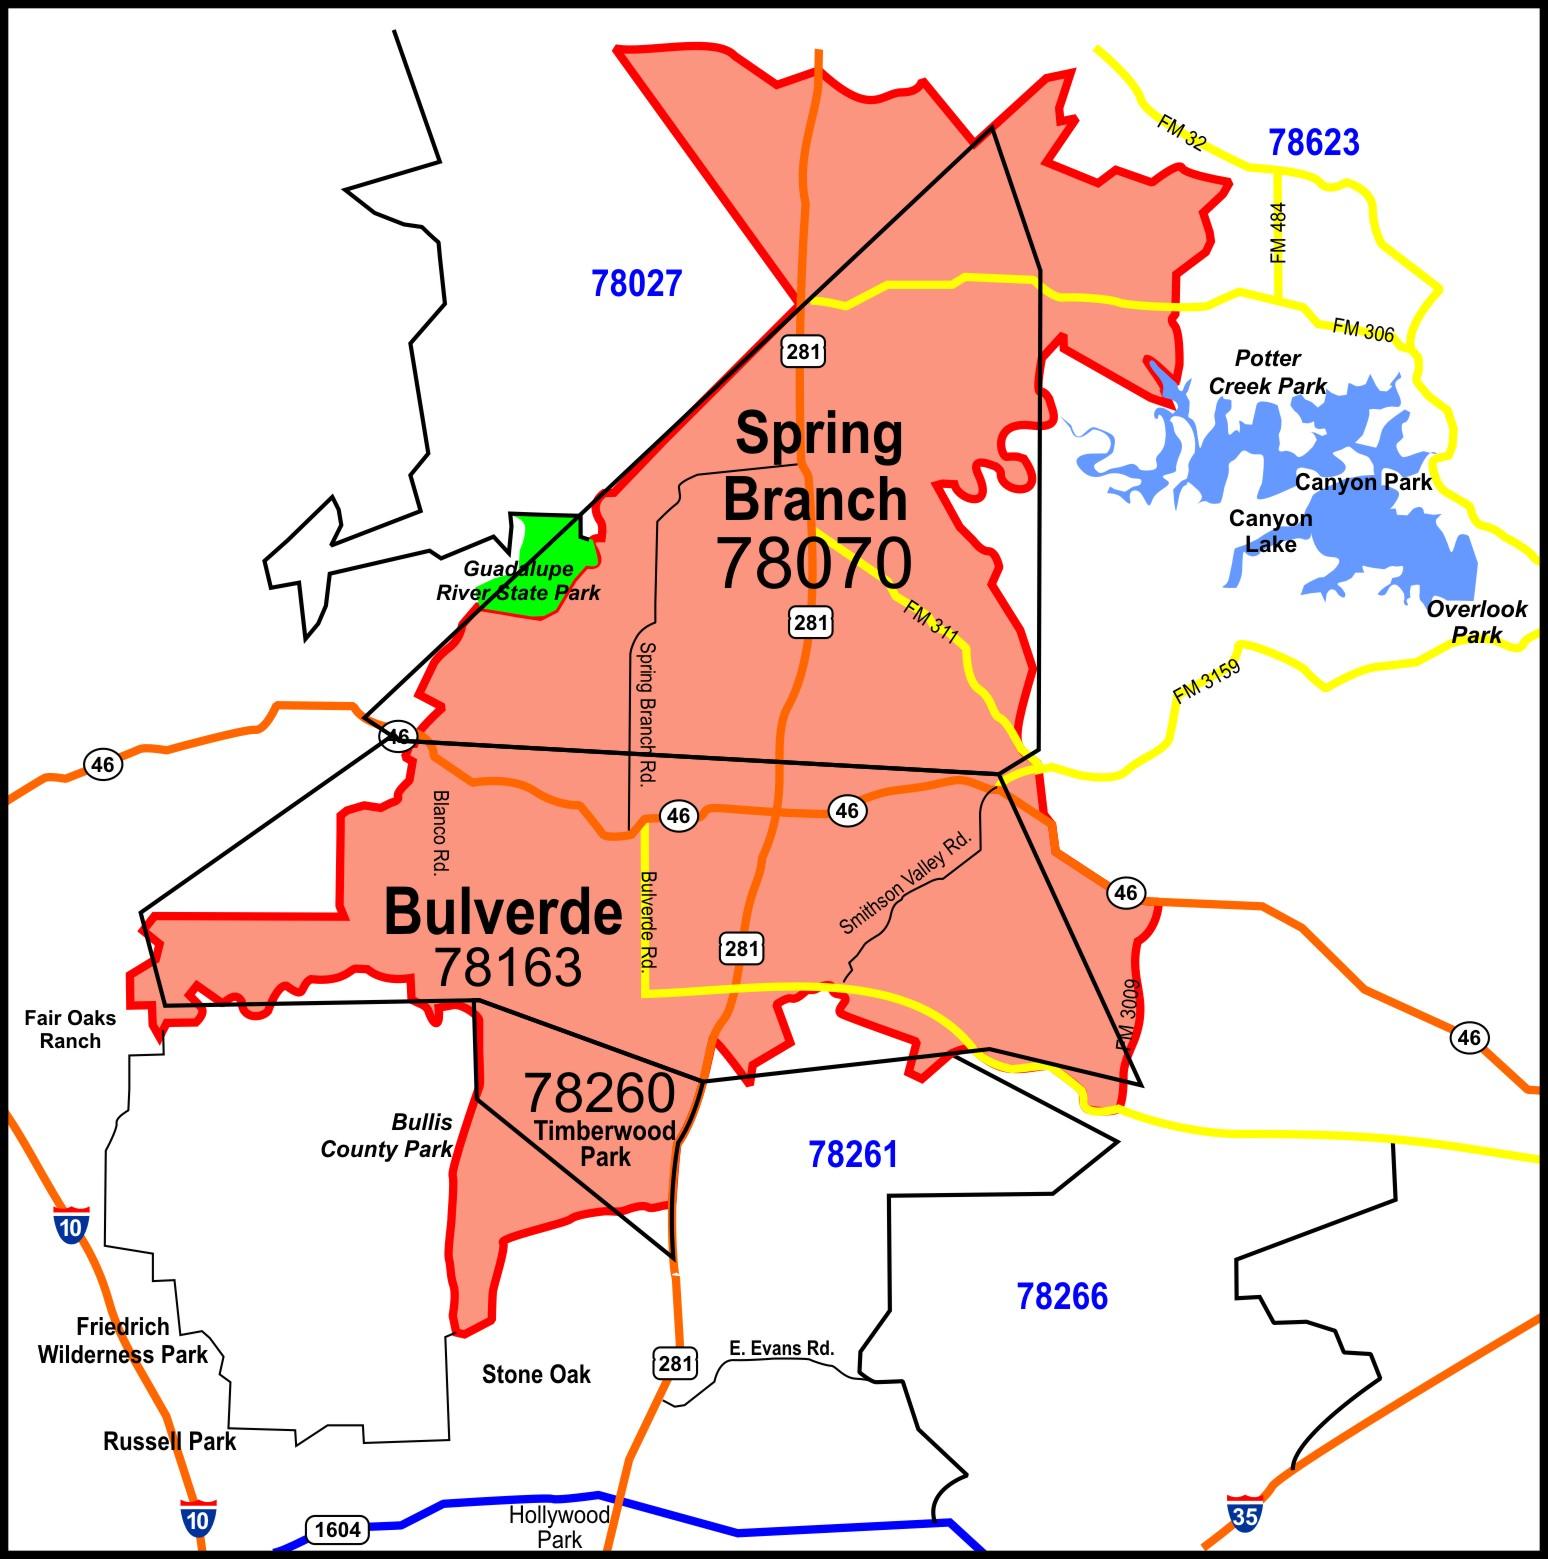 Demographics By Zip Code Map.Demographics Labor Data Bulverde Spring Branch Texas Edf